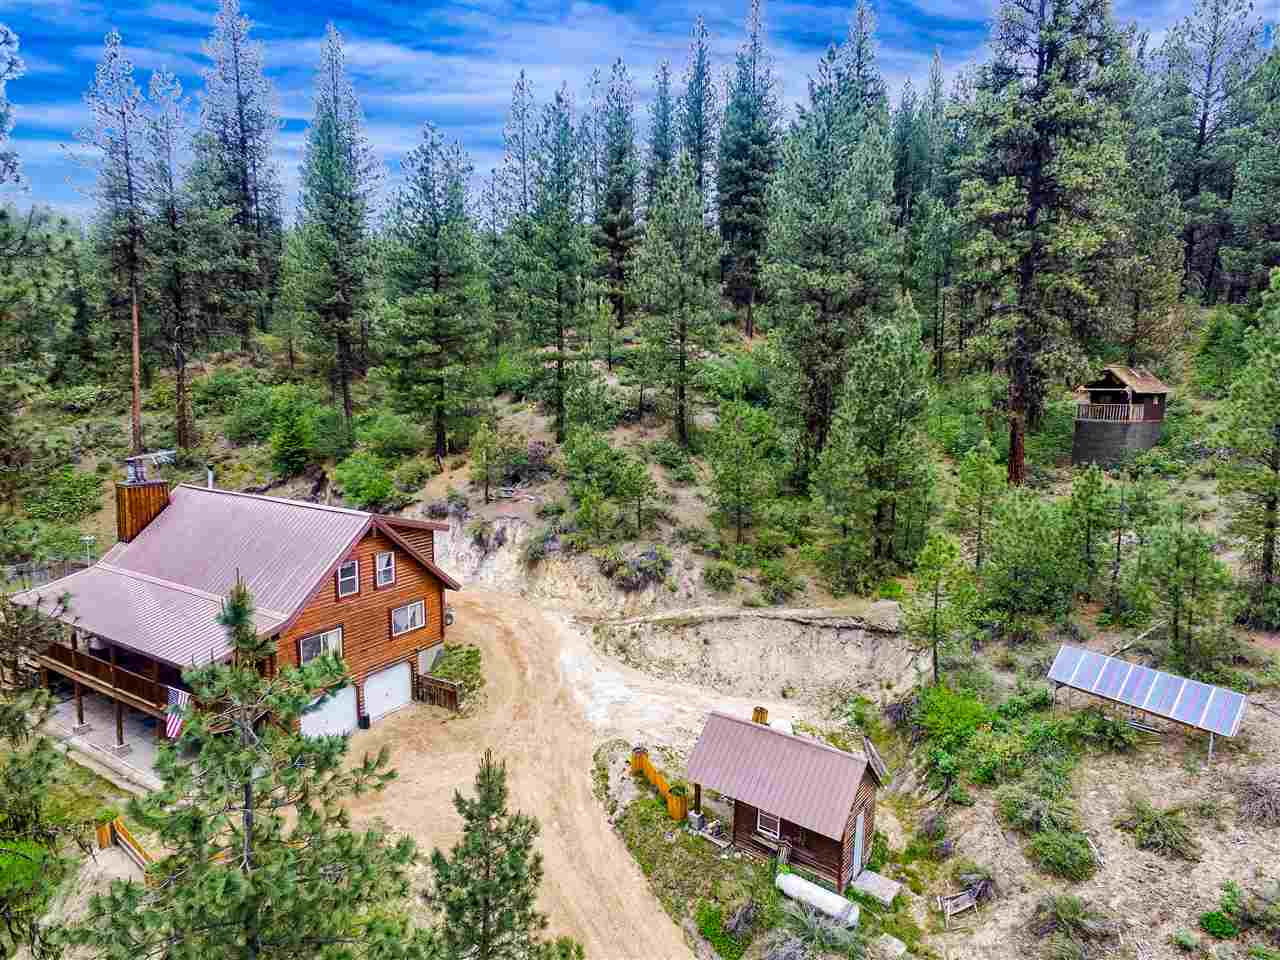 Casa Unifamiliar por un Venta en 4 Glen Forest Ln 4 Glen Forest Ln Idaho City, Idaho 83631